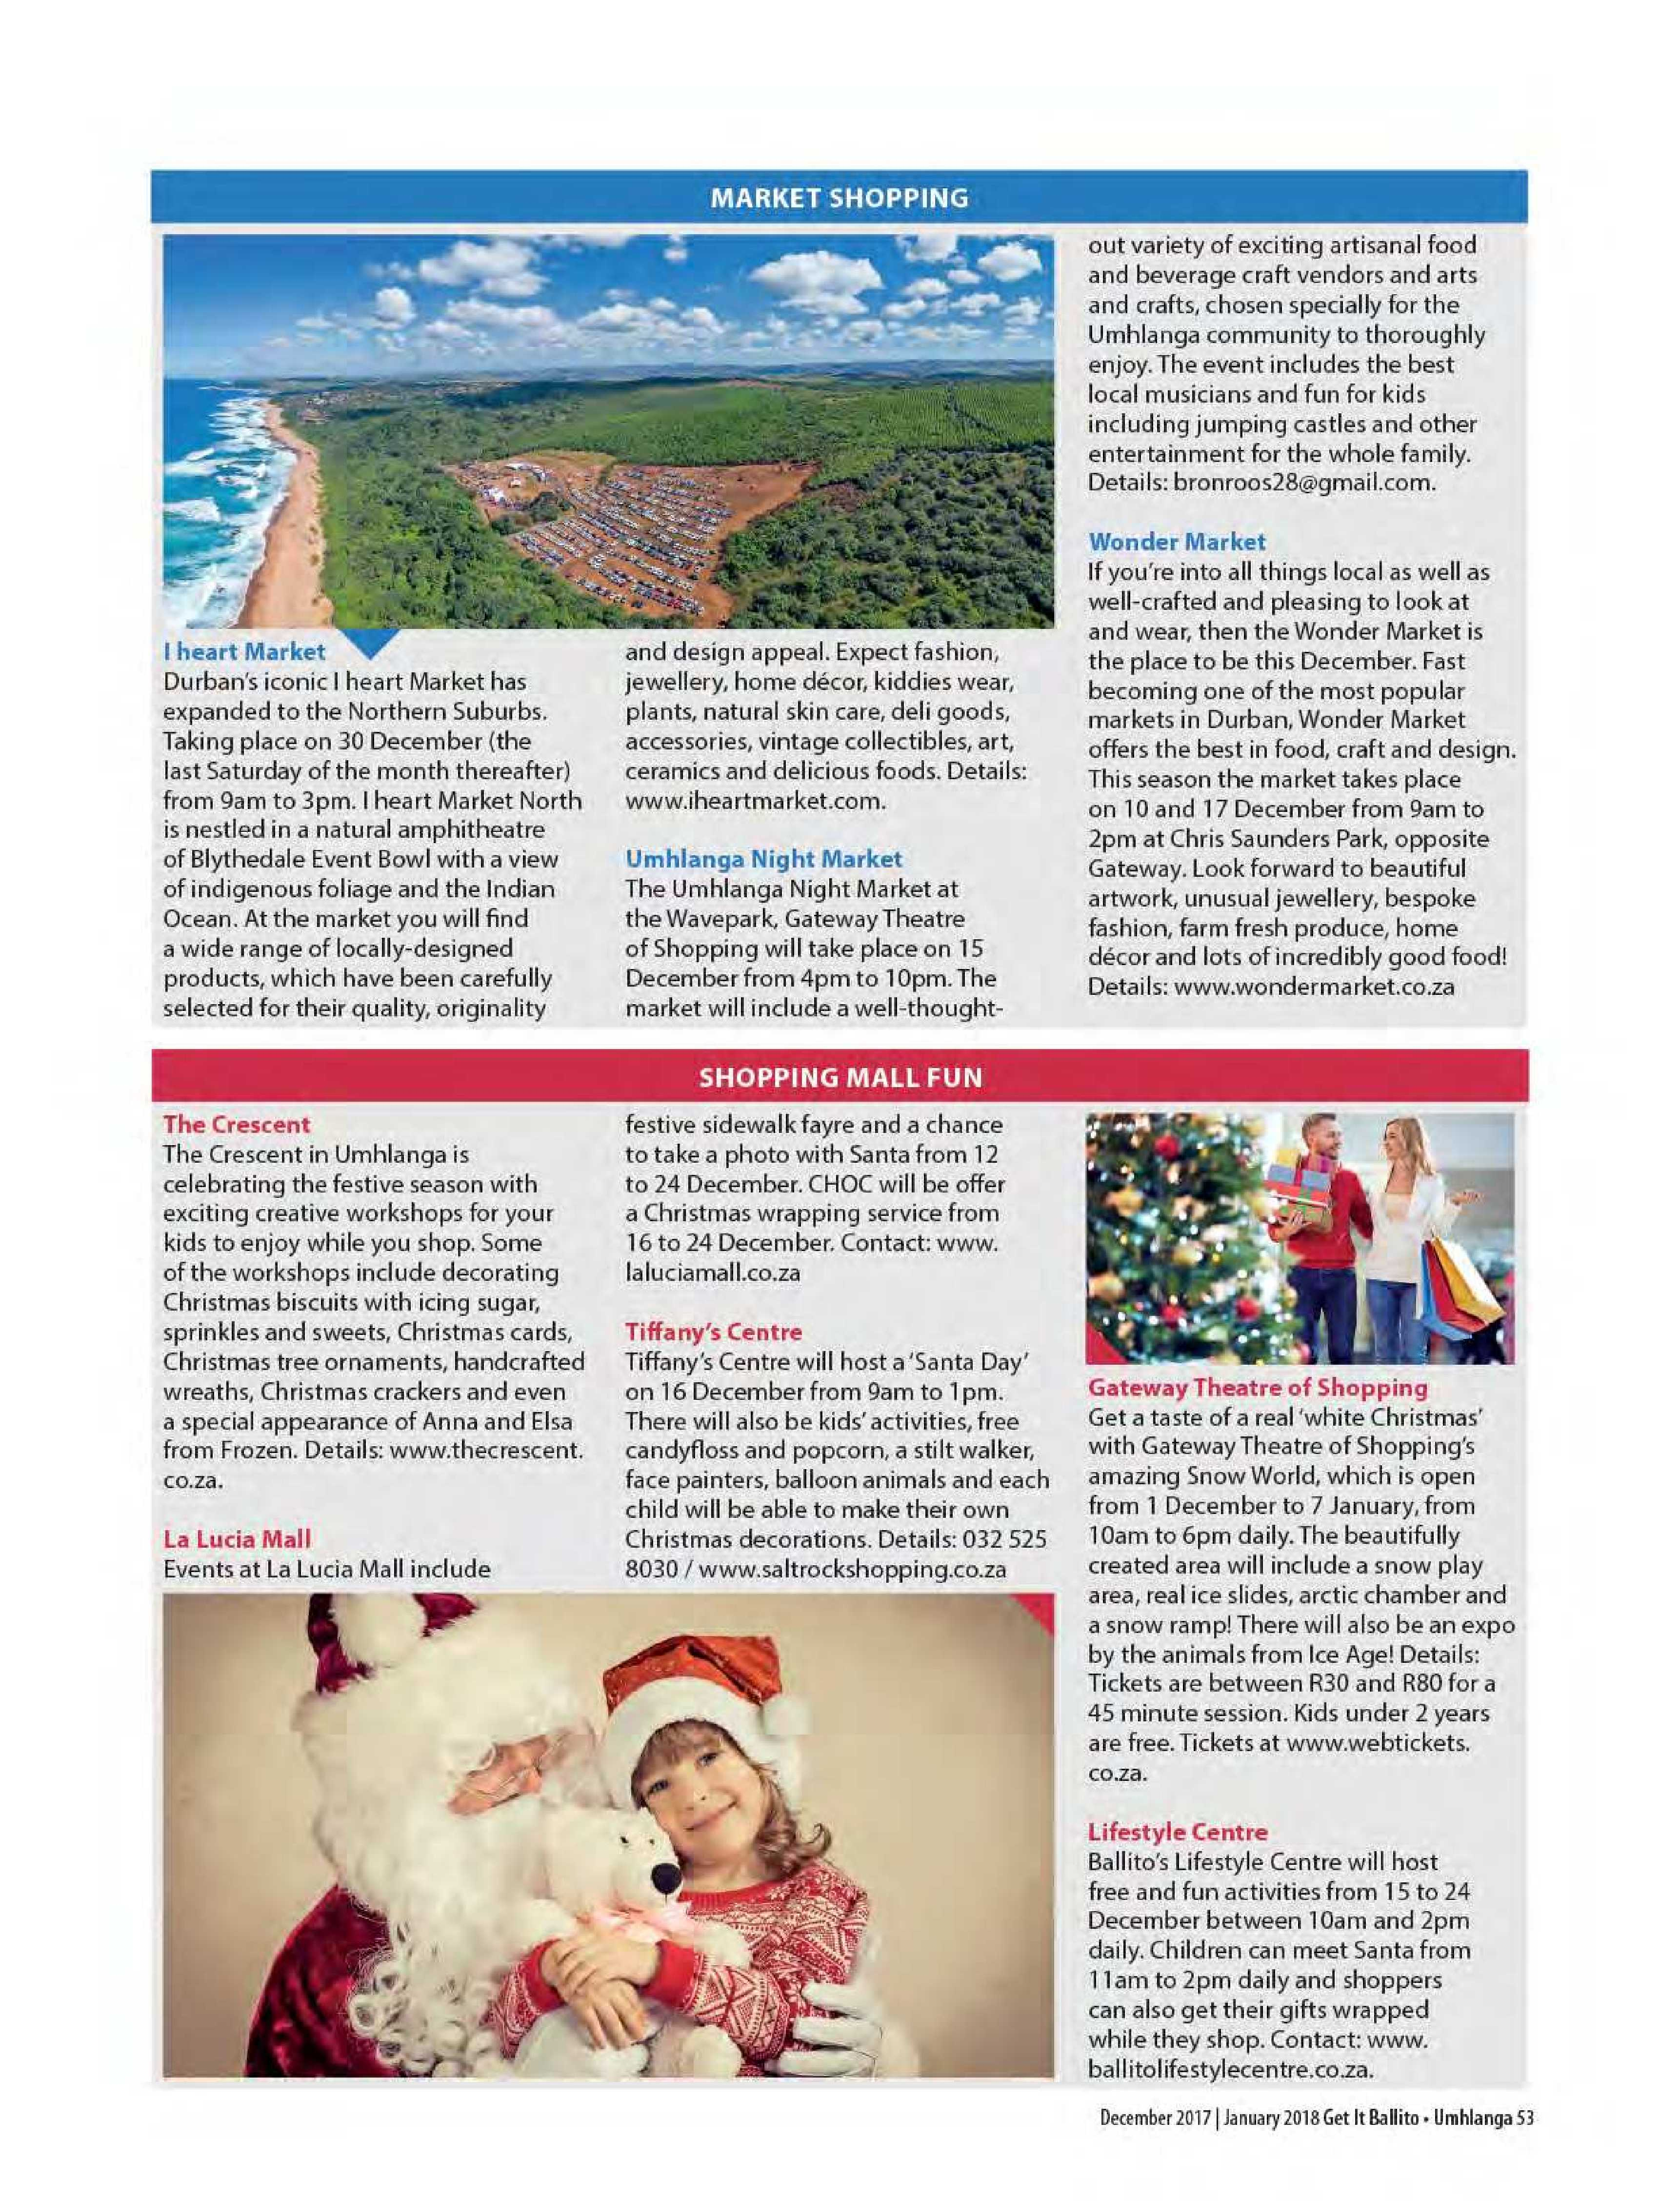 get-magazine-ballitoumhlanga-december-2017-january-2018-2-epapers-page-55